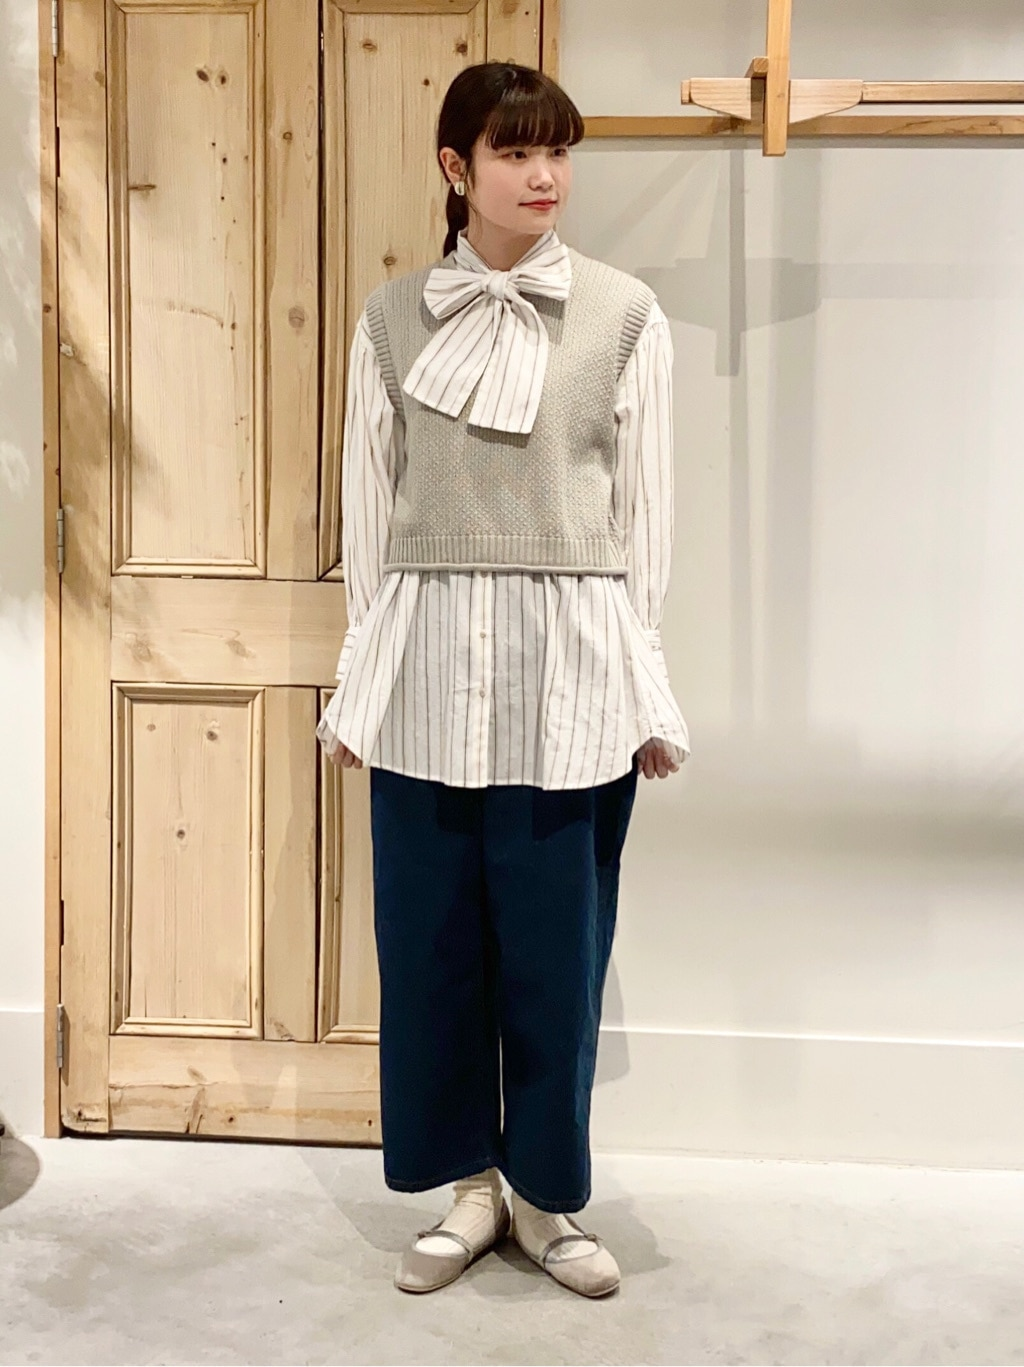 Malle chambre de charme 調布パルコ 身長:167cm 2021.02.12